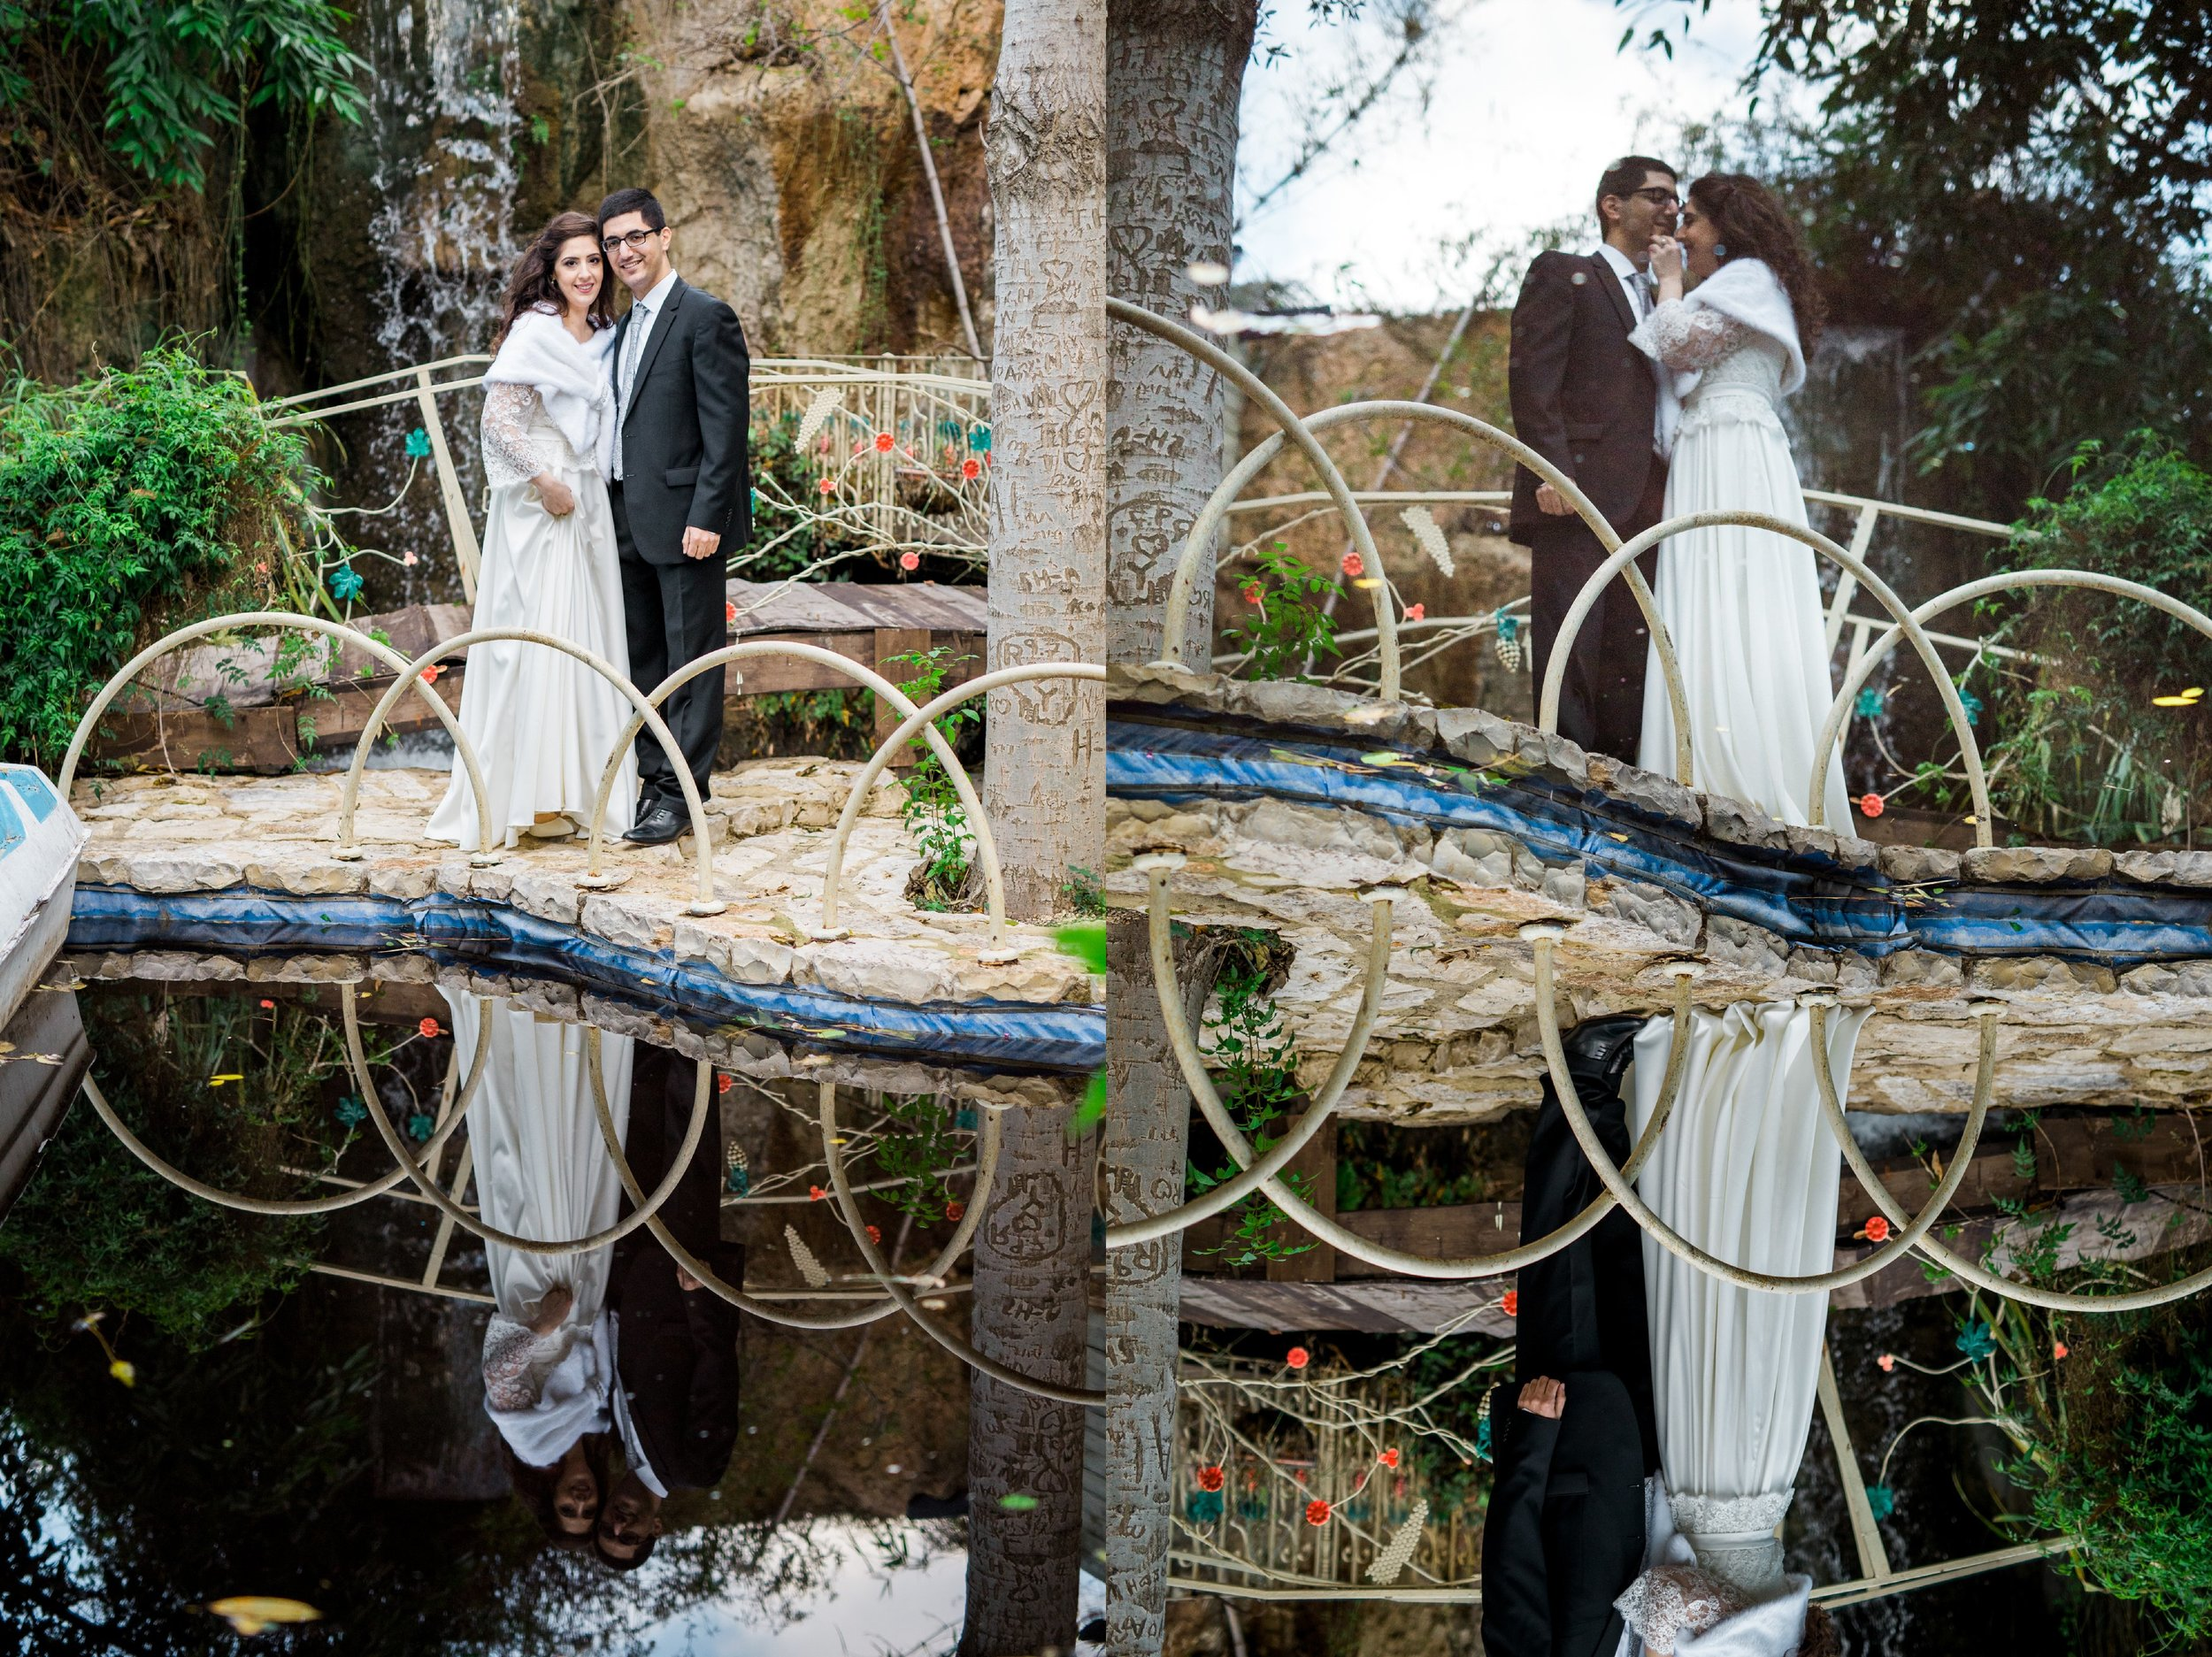 israel-garden-wedding-portraits-session-kate-giryes-photography--62_WEB.jpg